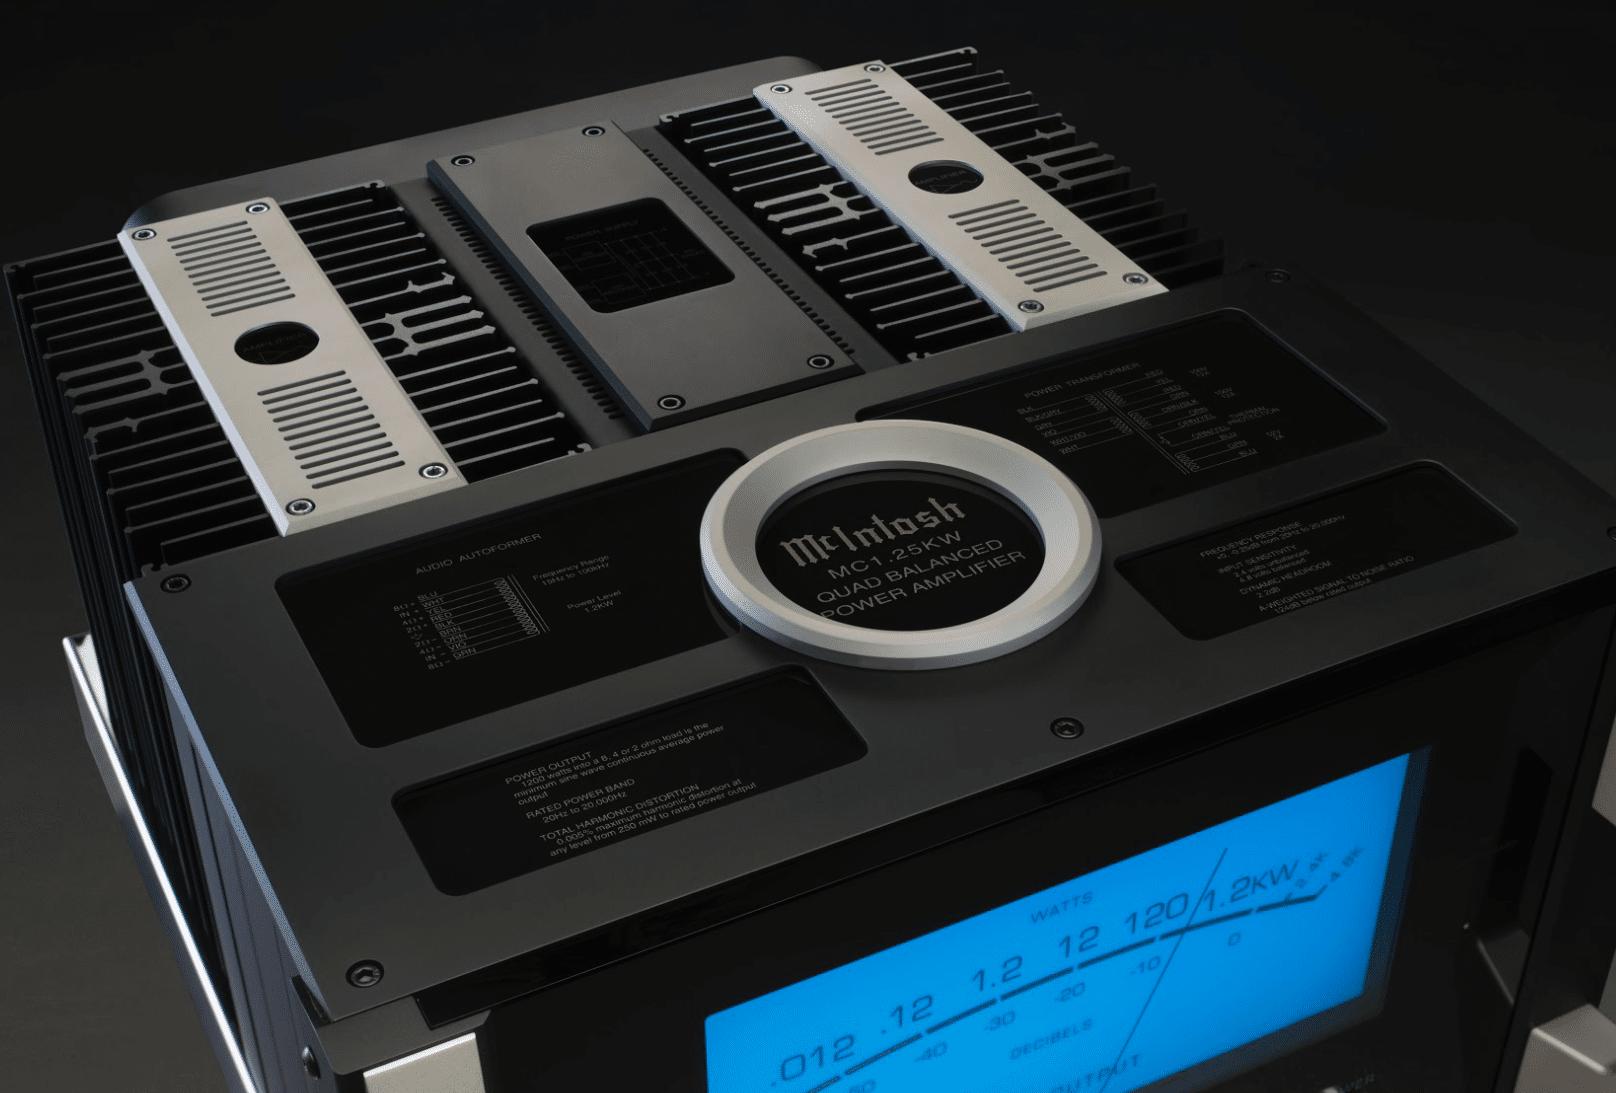 McIntosh MC1 25KW Quad Balanced Power Amplifier: single-chassis